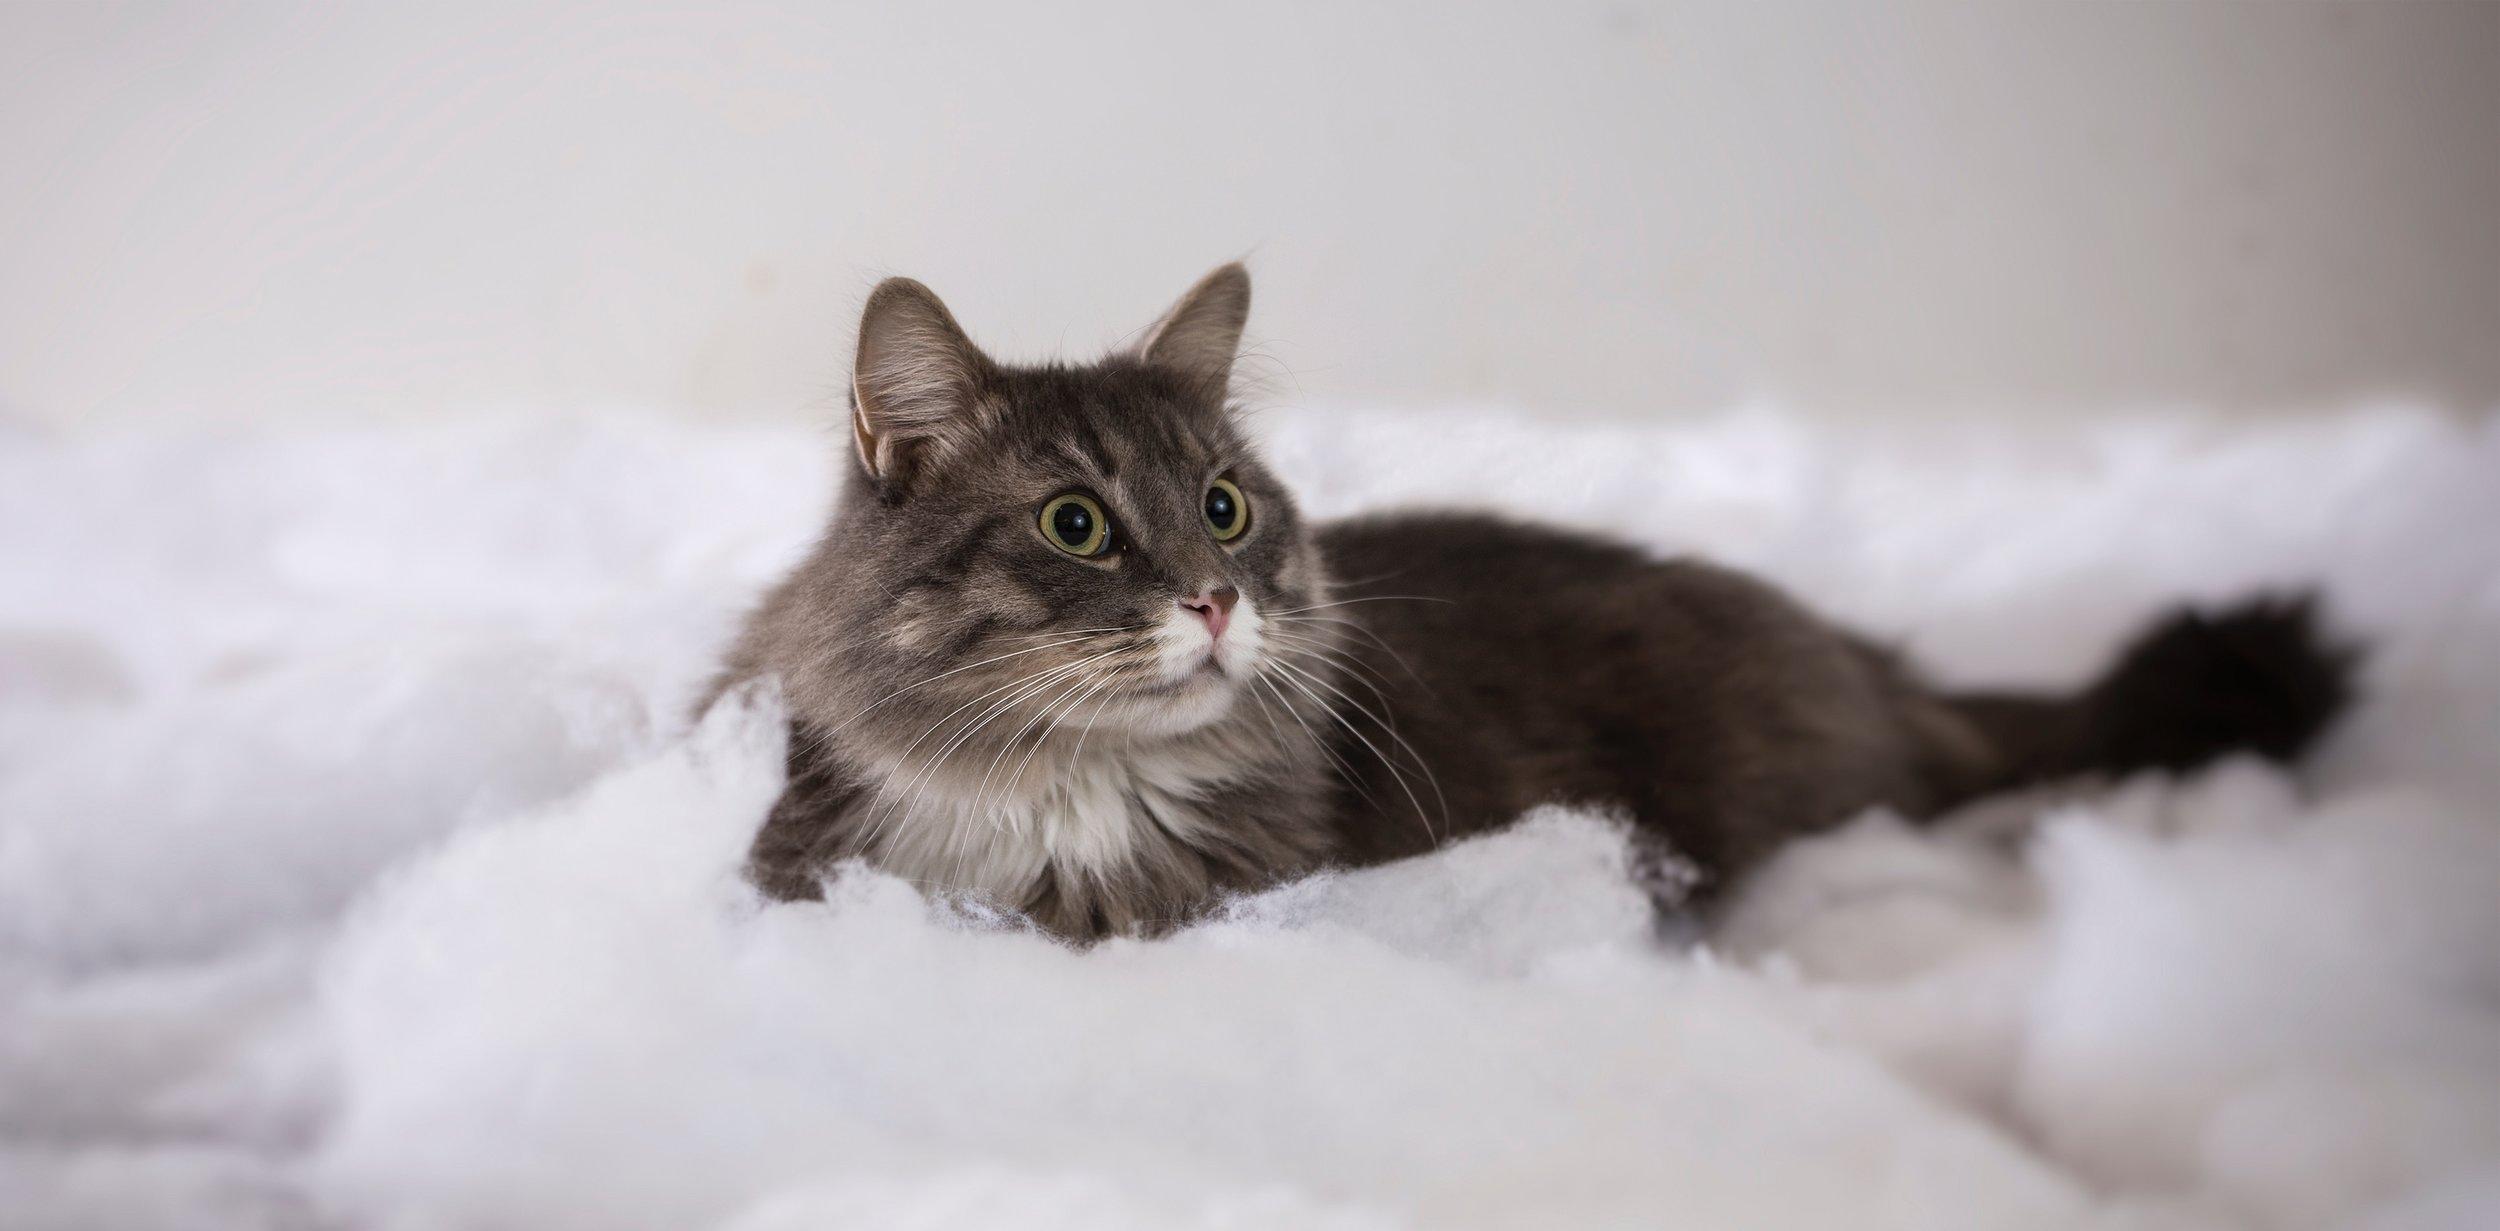 KITTENS cats #cutecats #catadvice